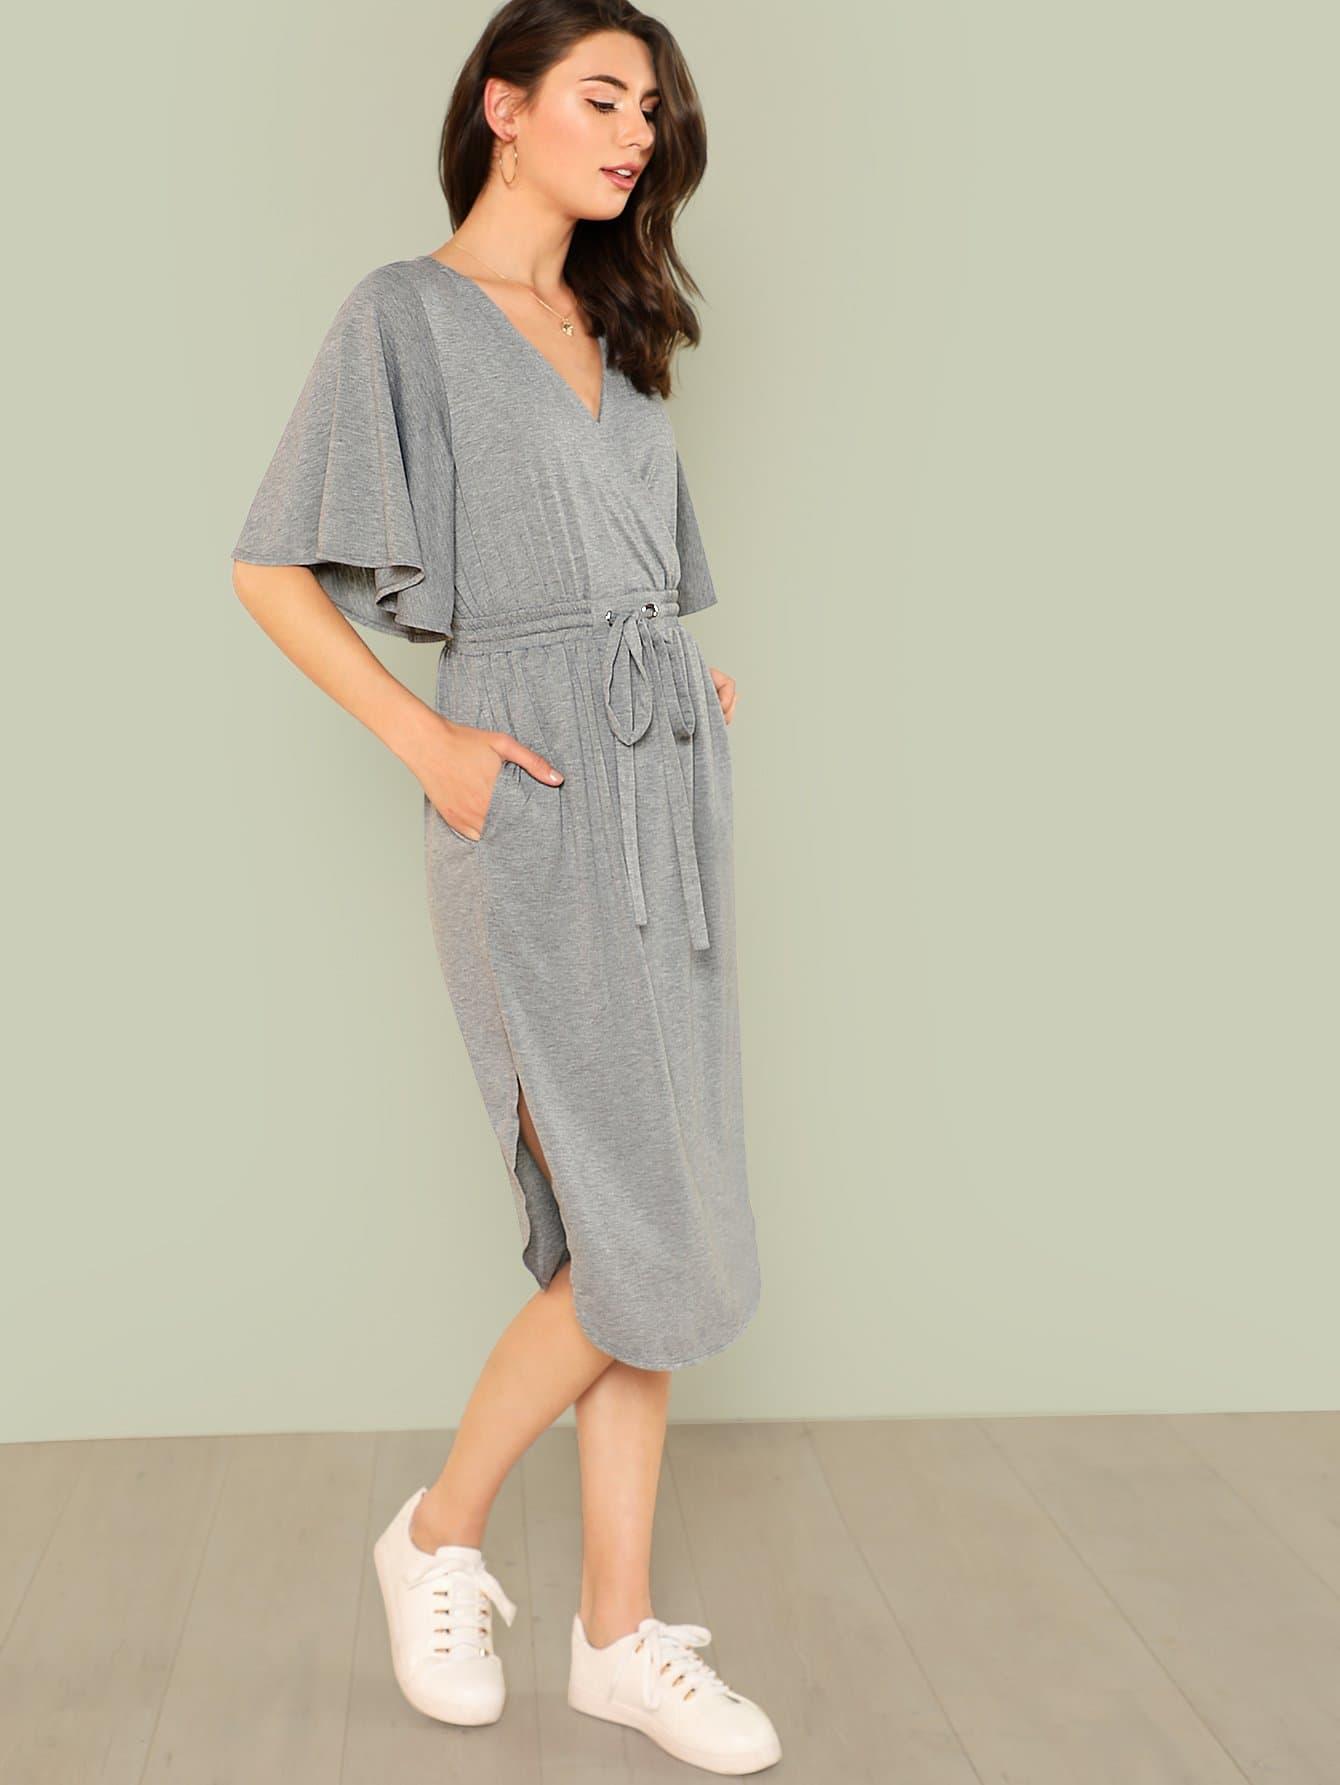 Tie Waist Bell Sleeve Heather Knit Wrap Dress bell sleeve rib knit dress